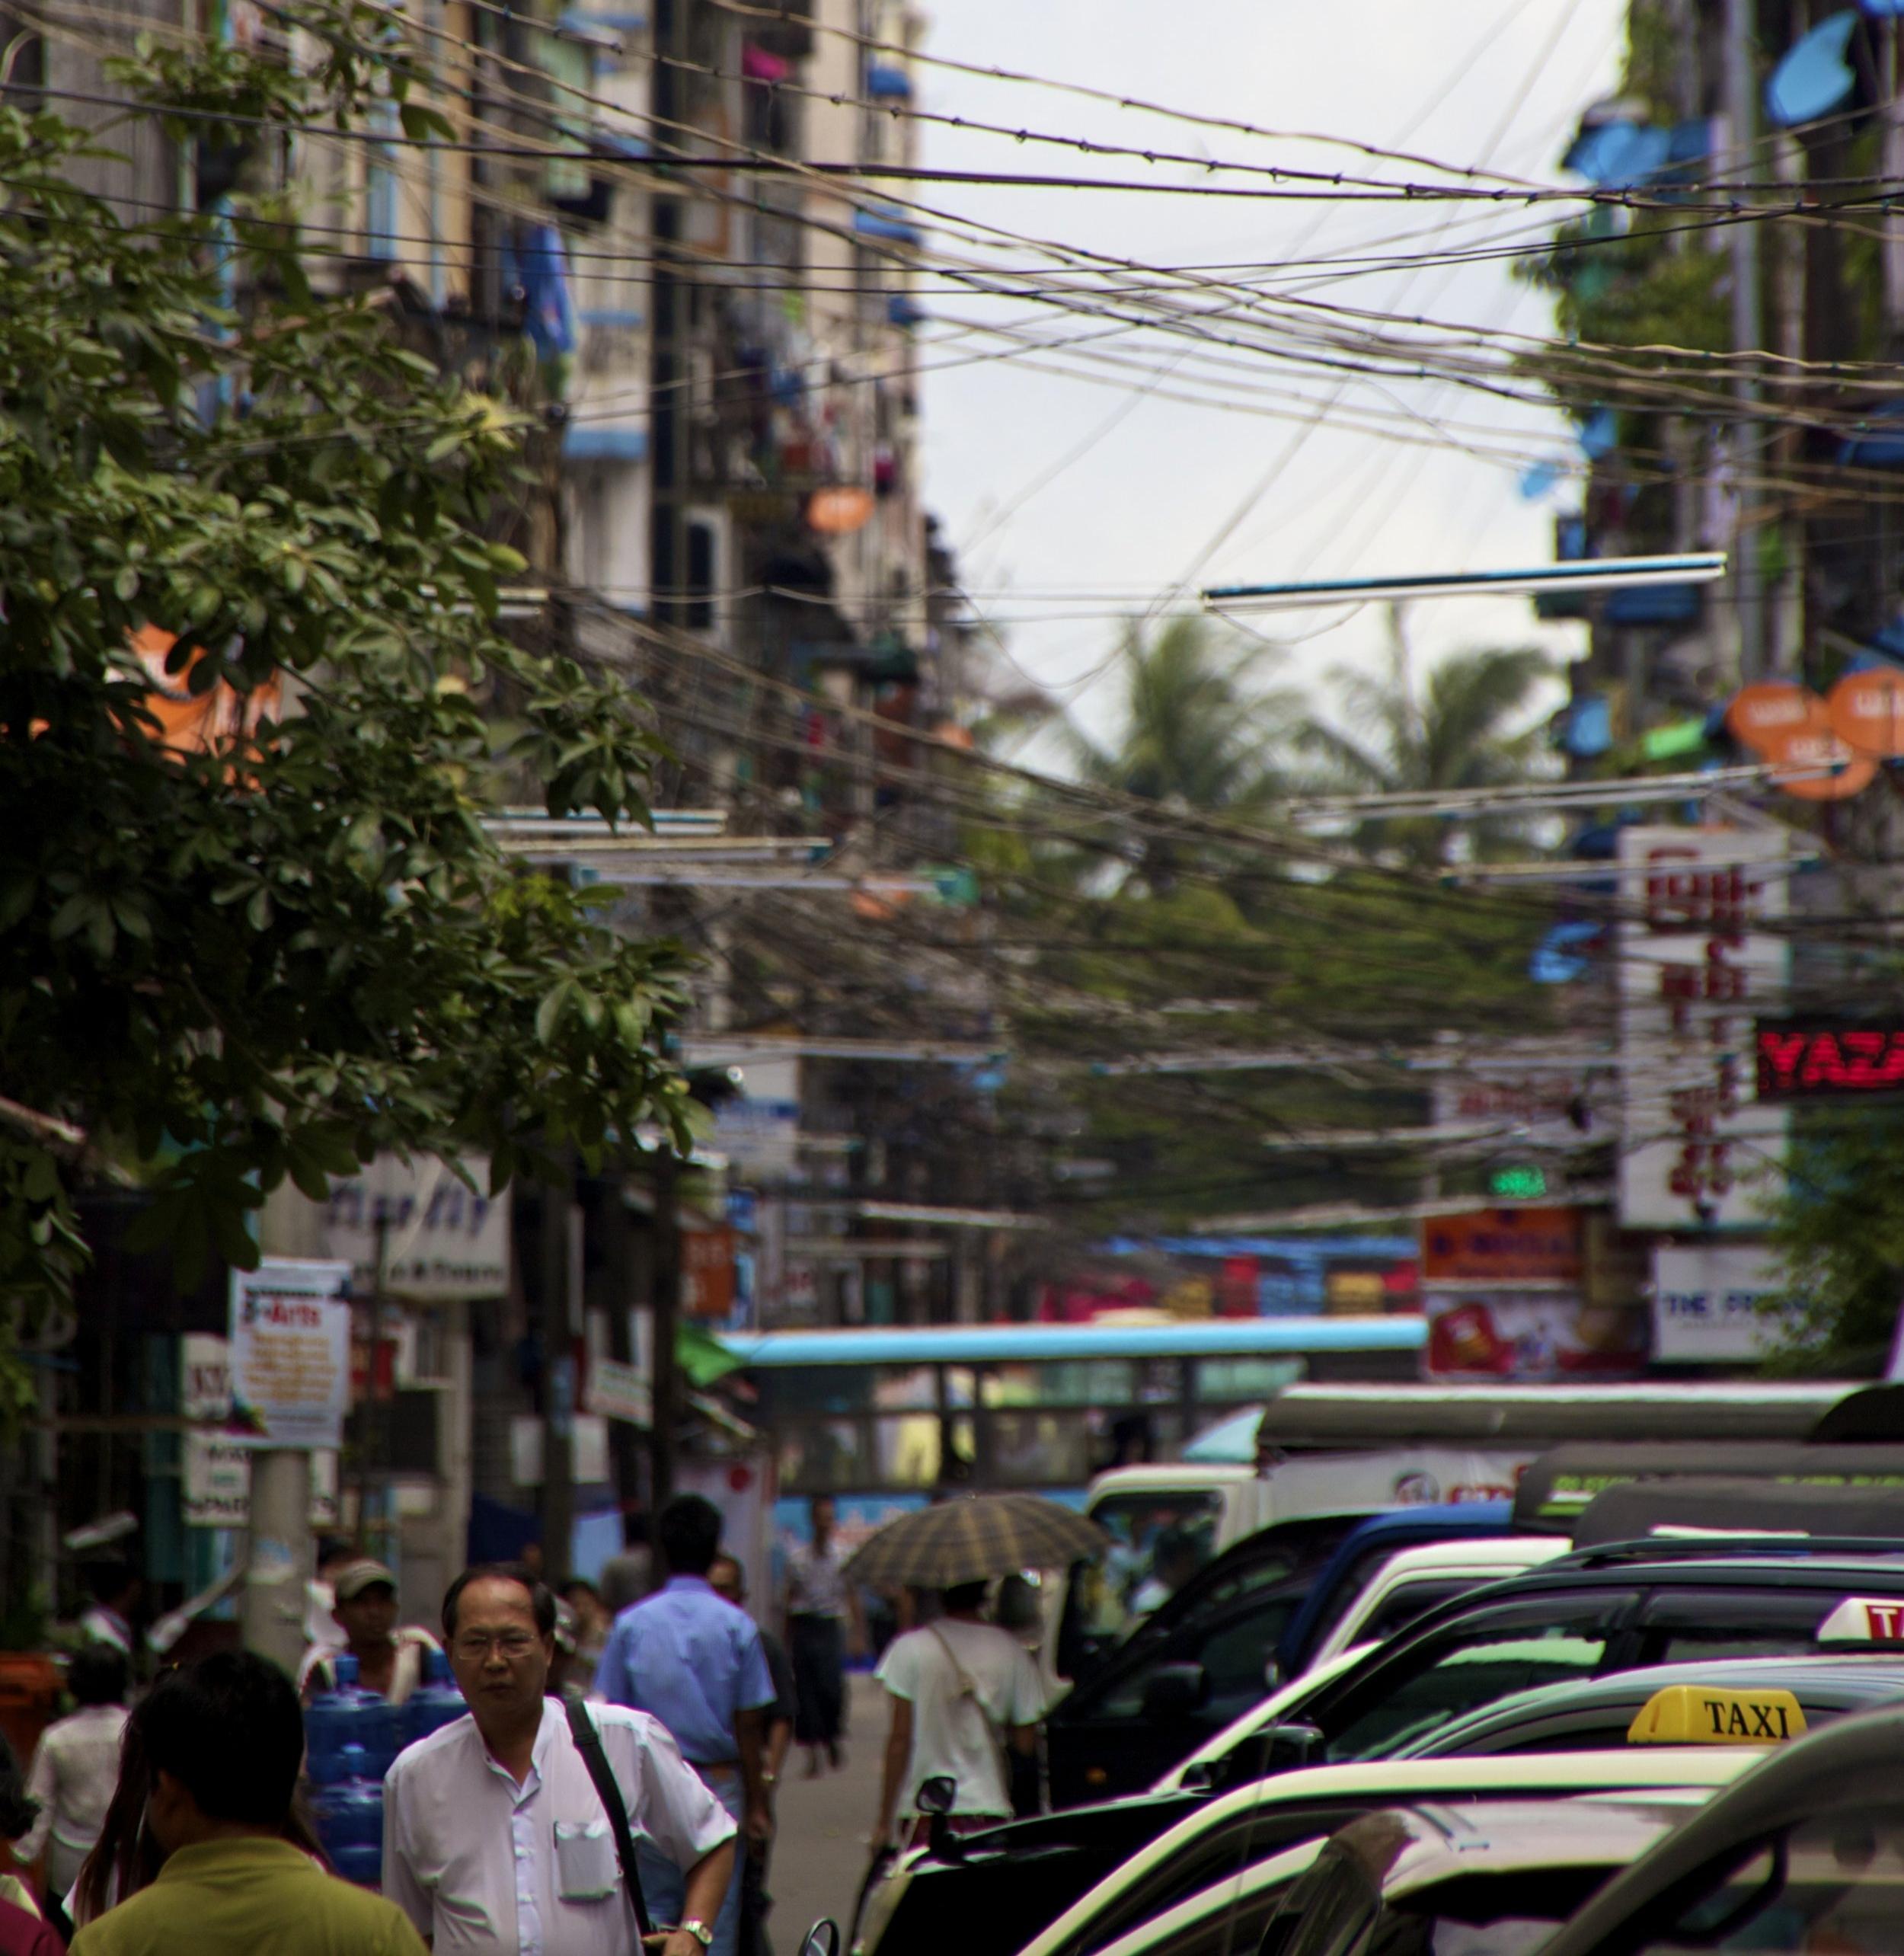 rangoon burma yangon myanmar 1.jpg